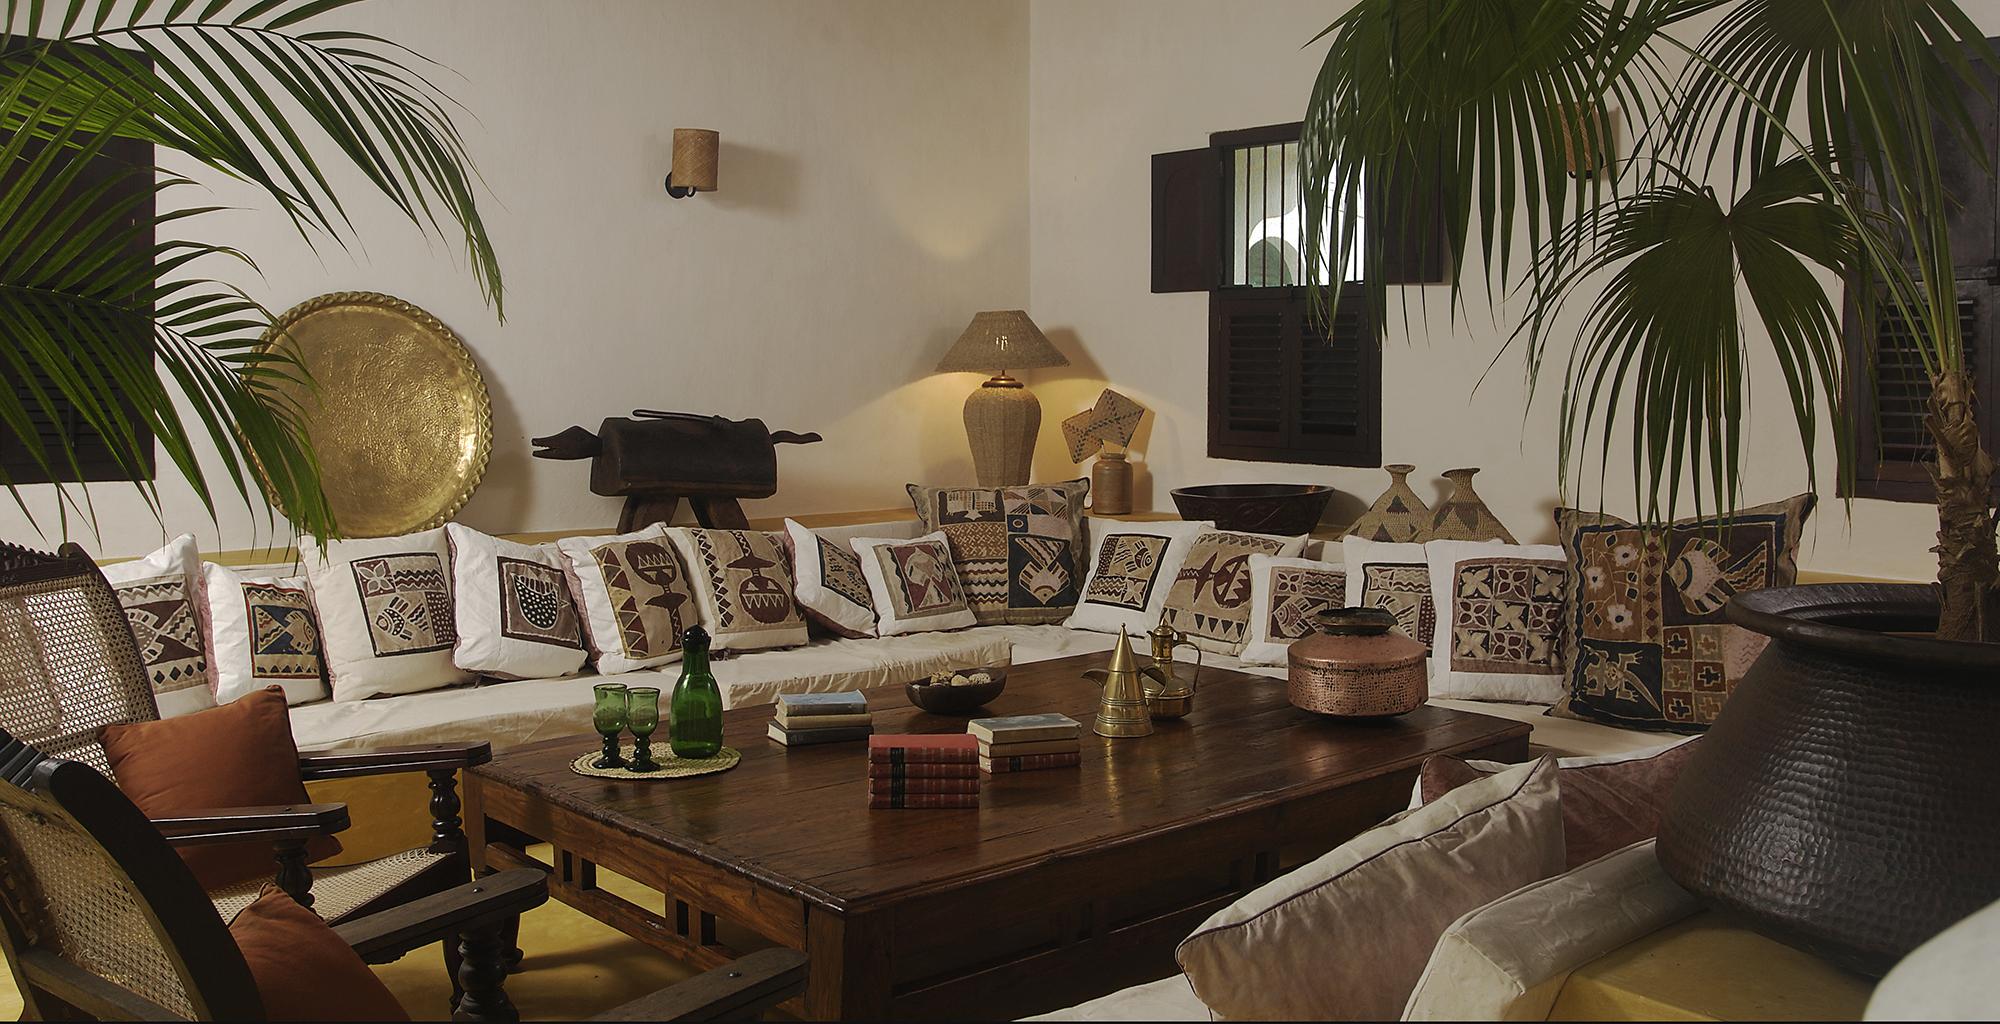 Kenya-Shela-And-Palm-House-Living-Room